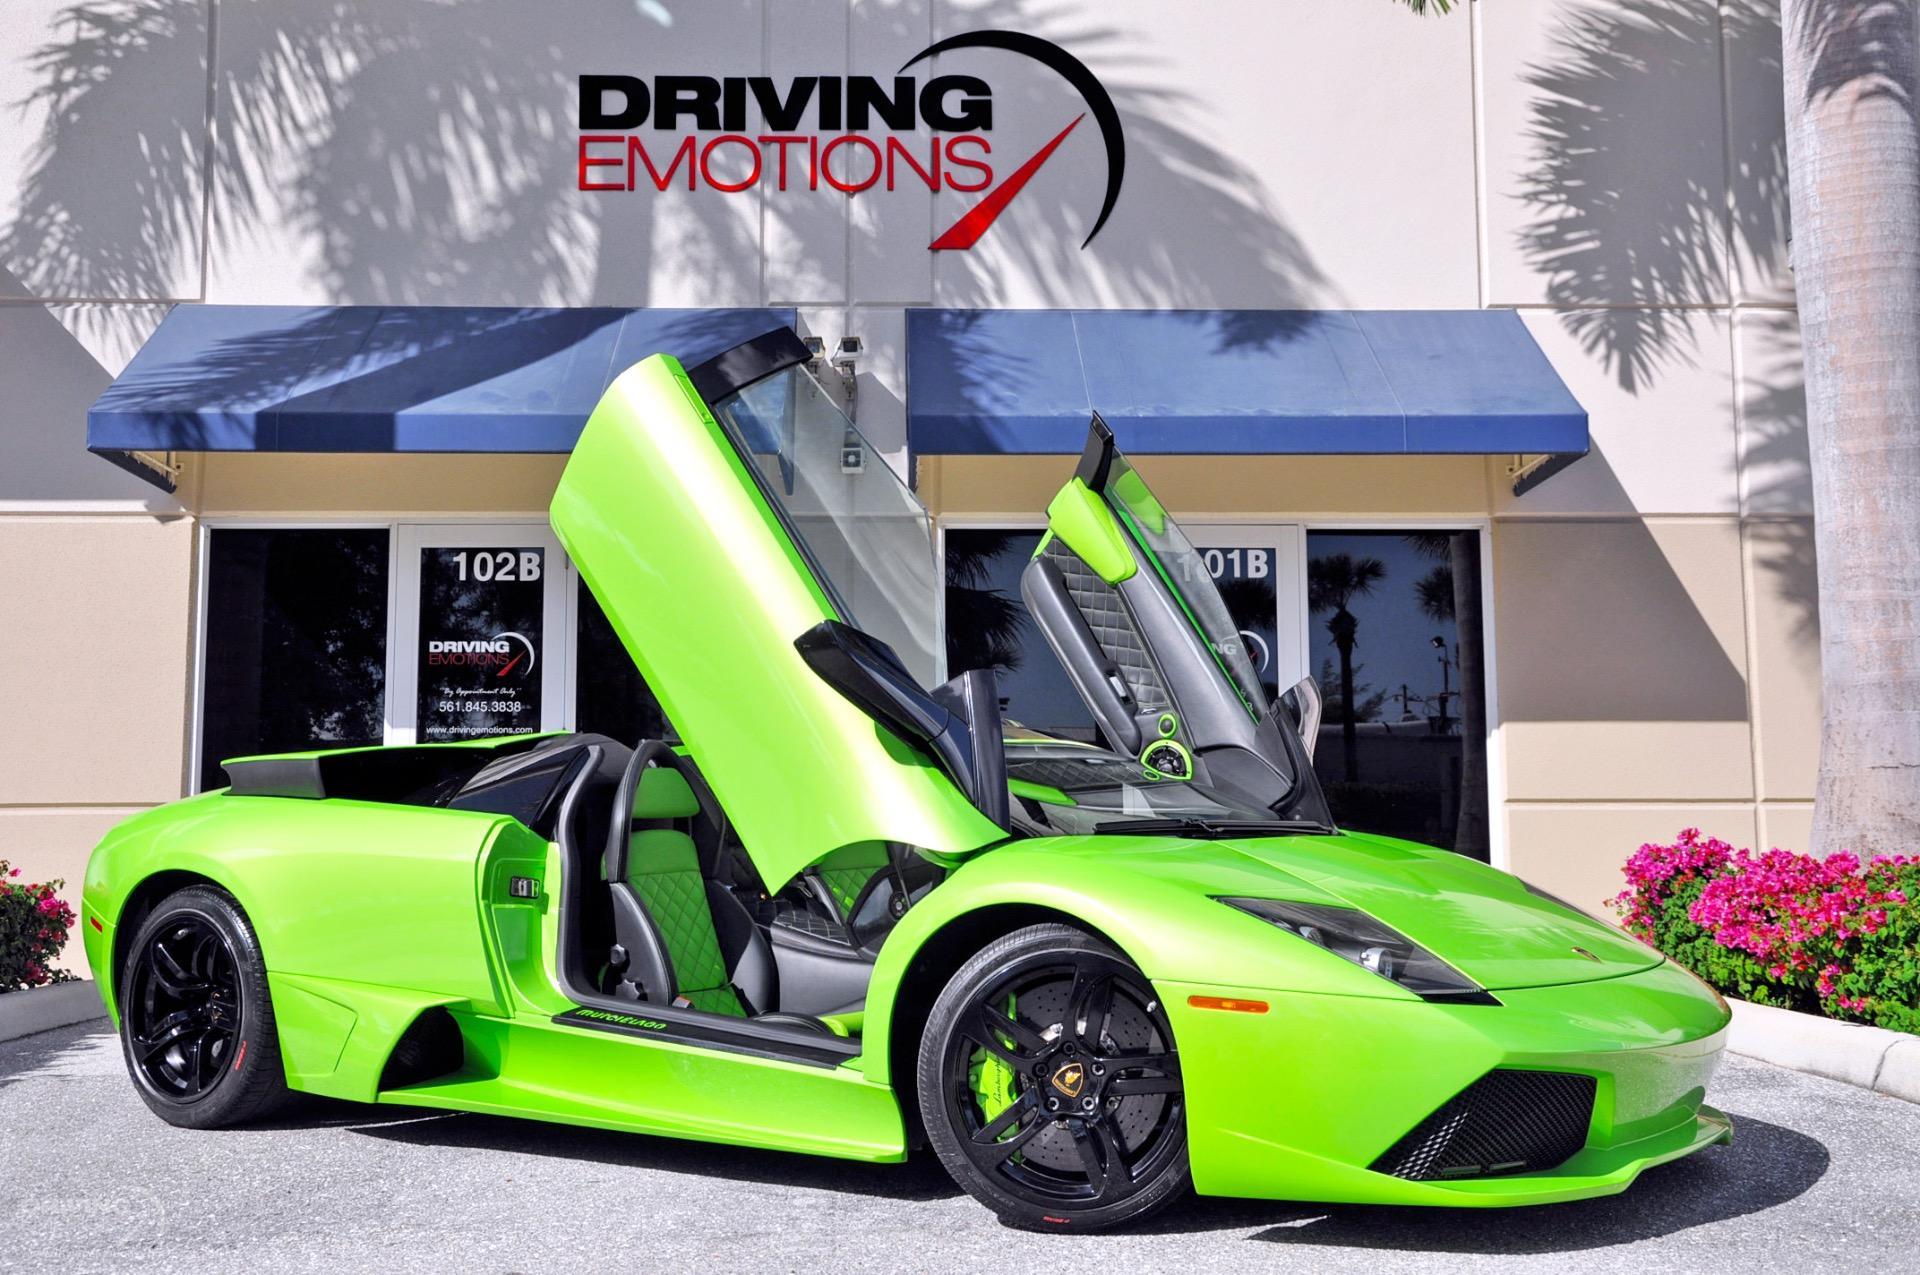 2009 Lamborghini Murcielago LP640 Roadster LP 640 Roadster Stock # 6071 for  sale near Lake Park, FL | FL Lamborghini Dealer